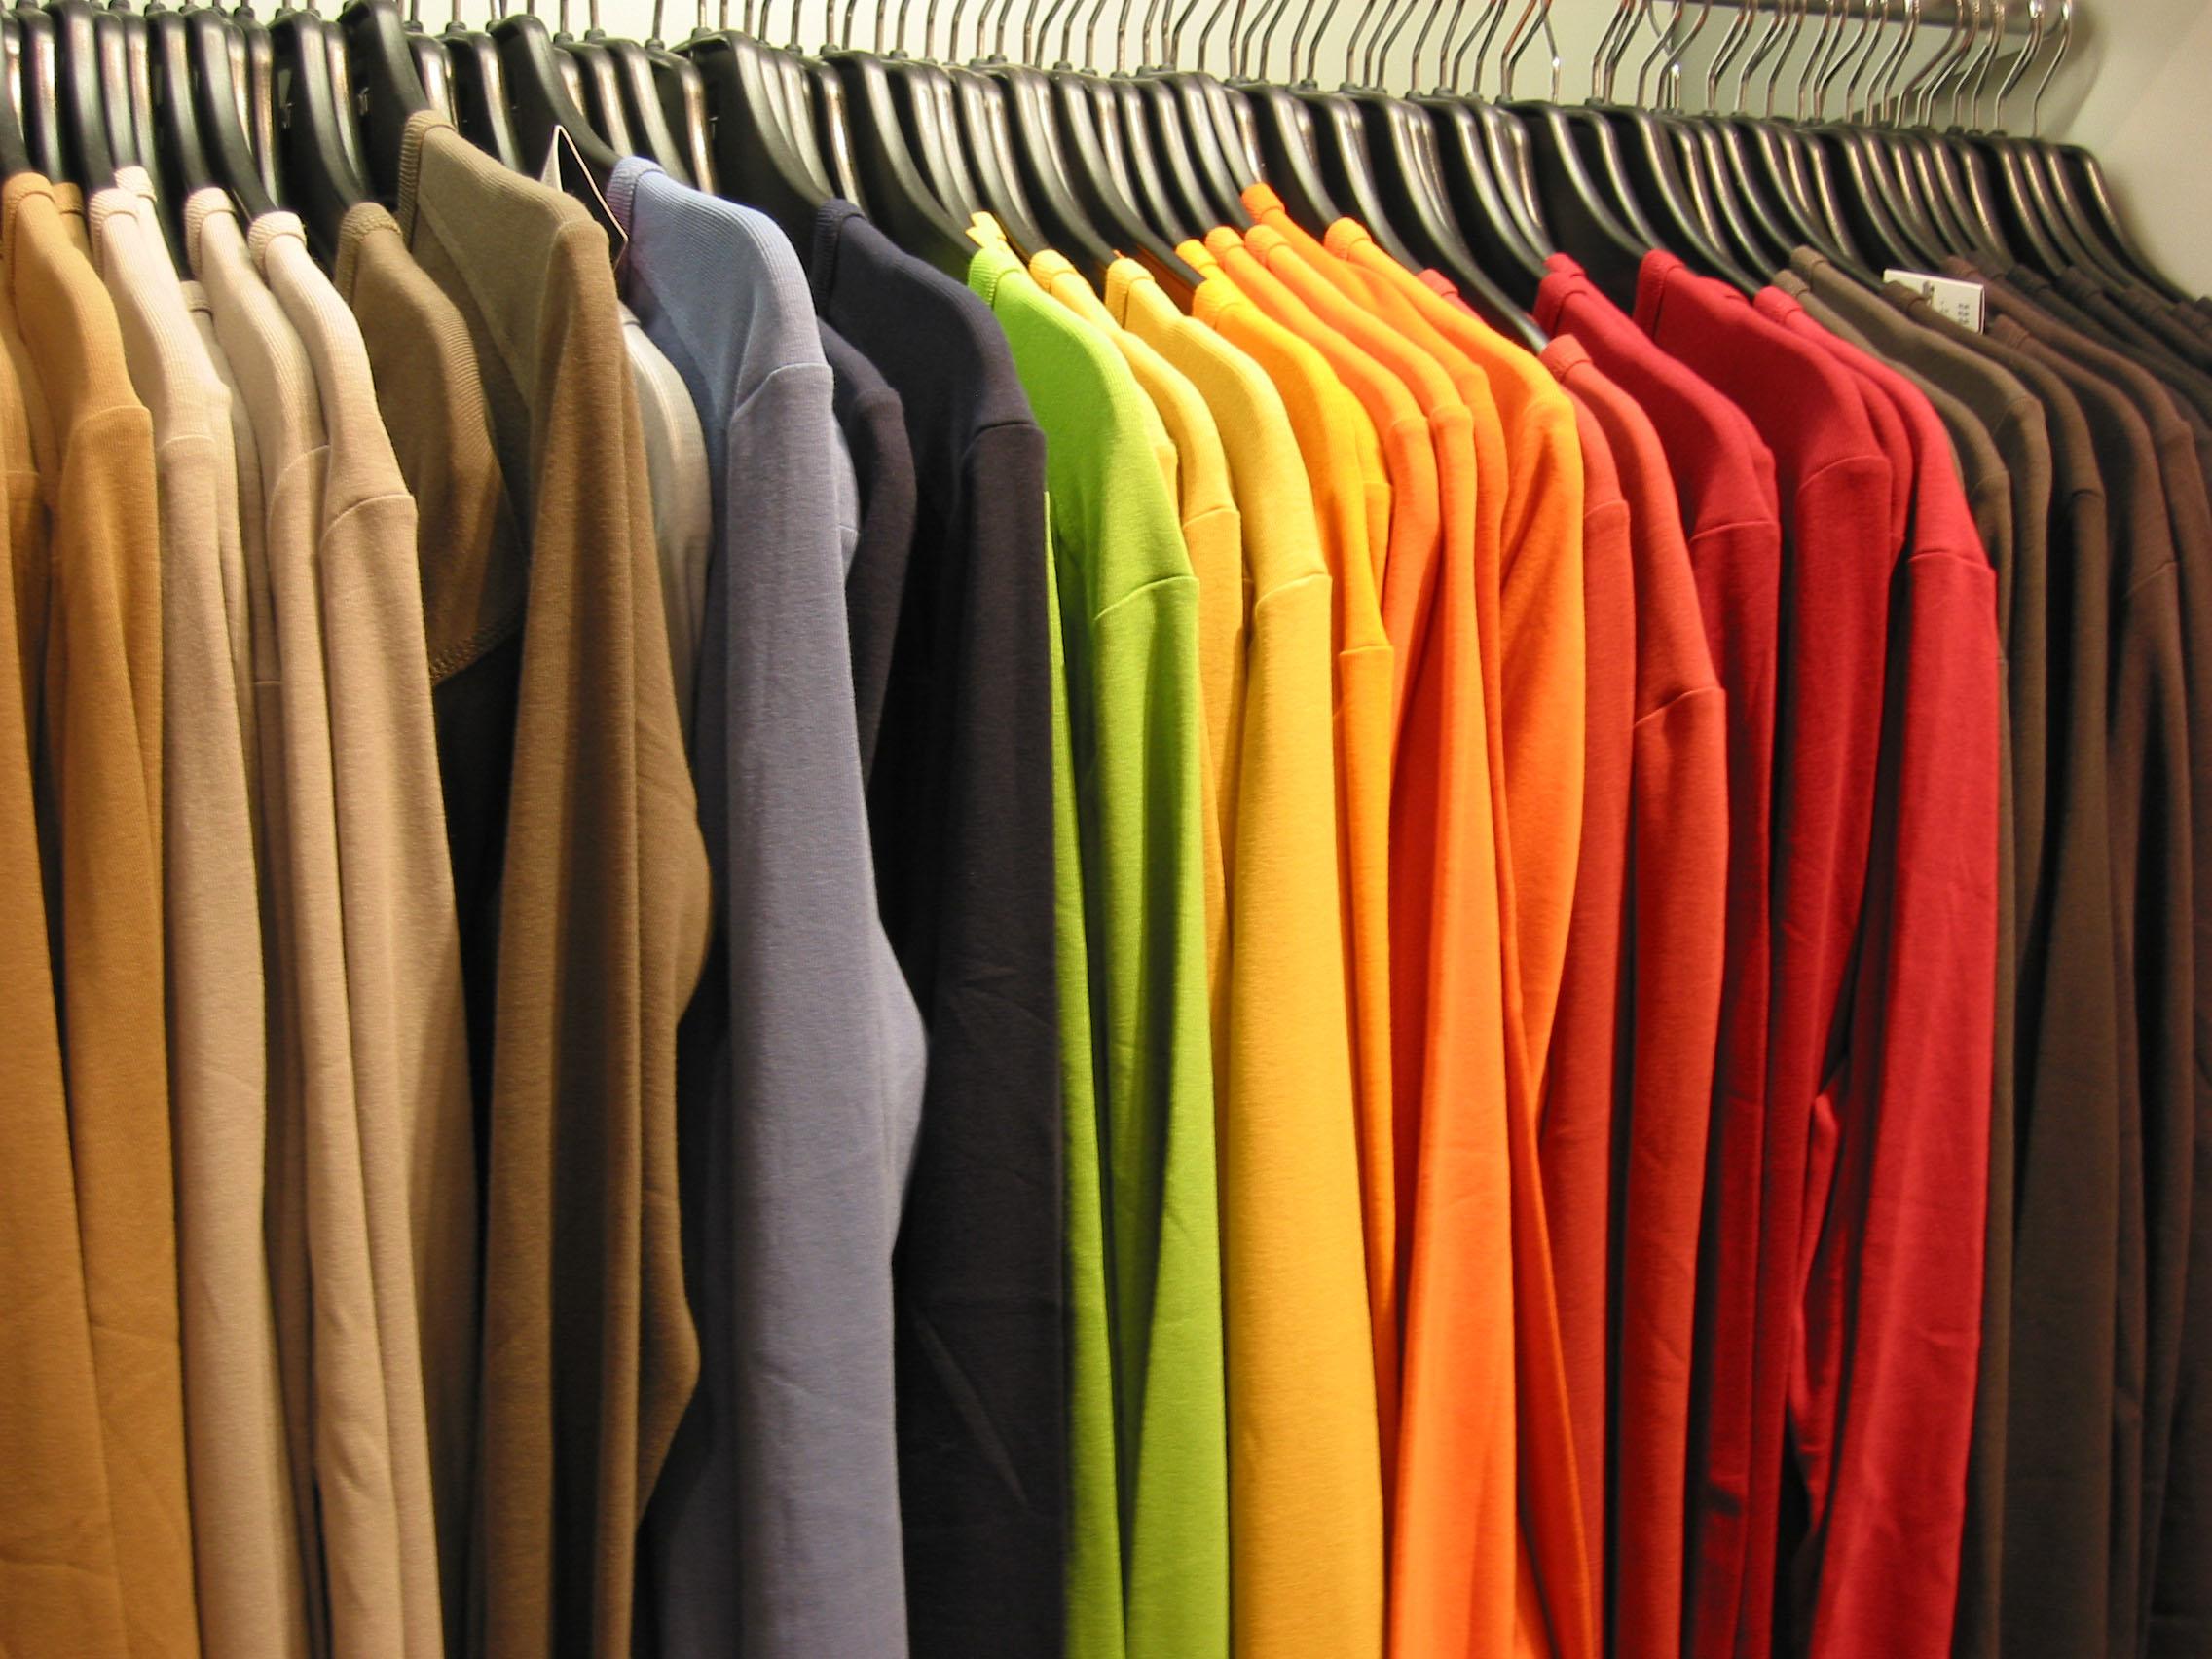 انتخاب لباس مناسب پوست